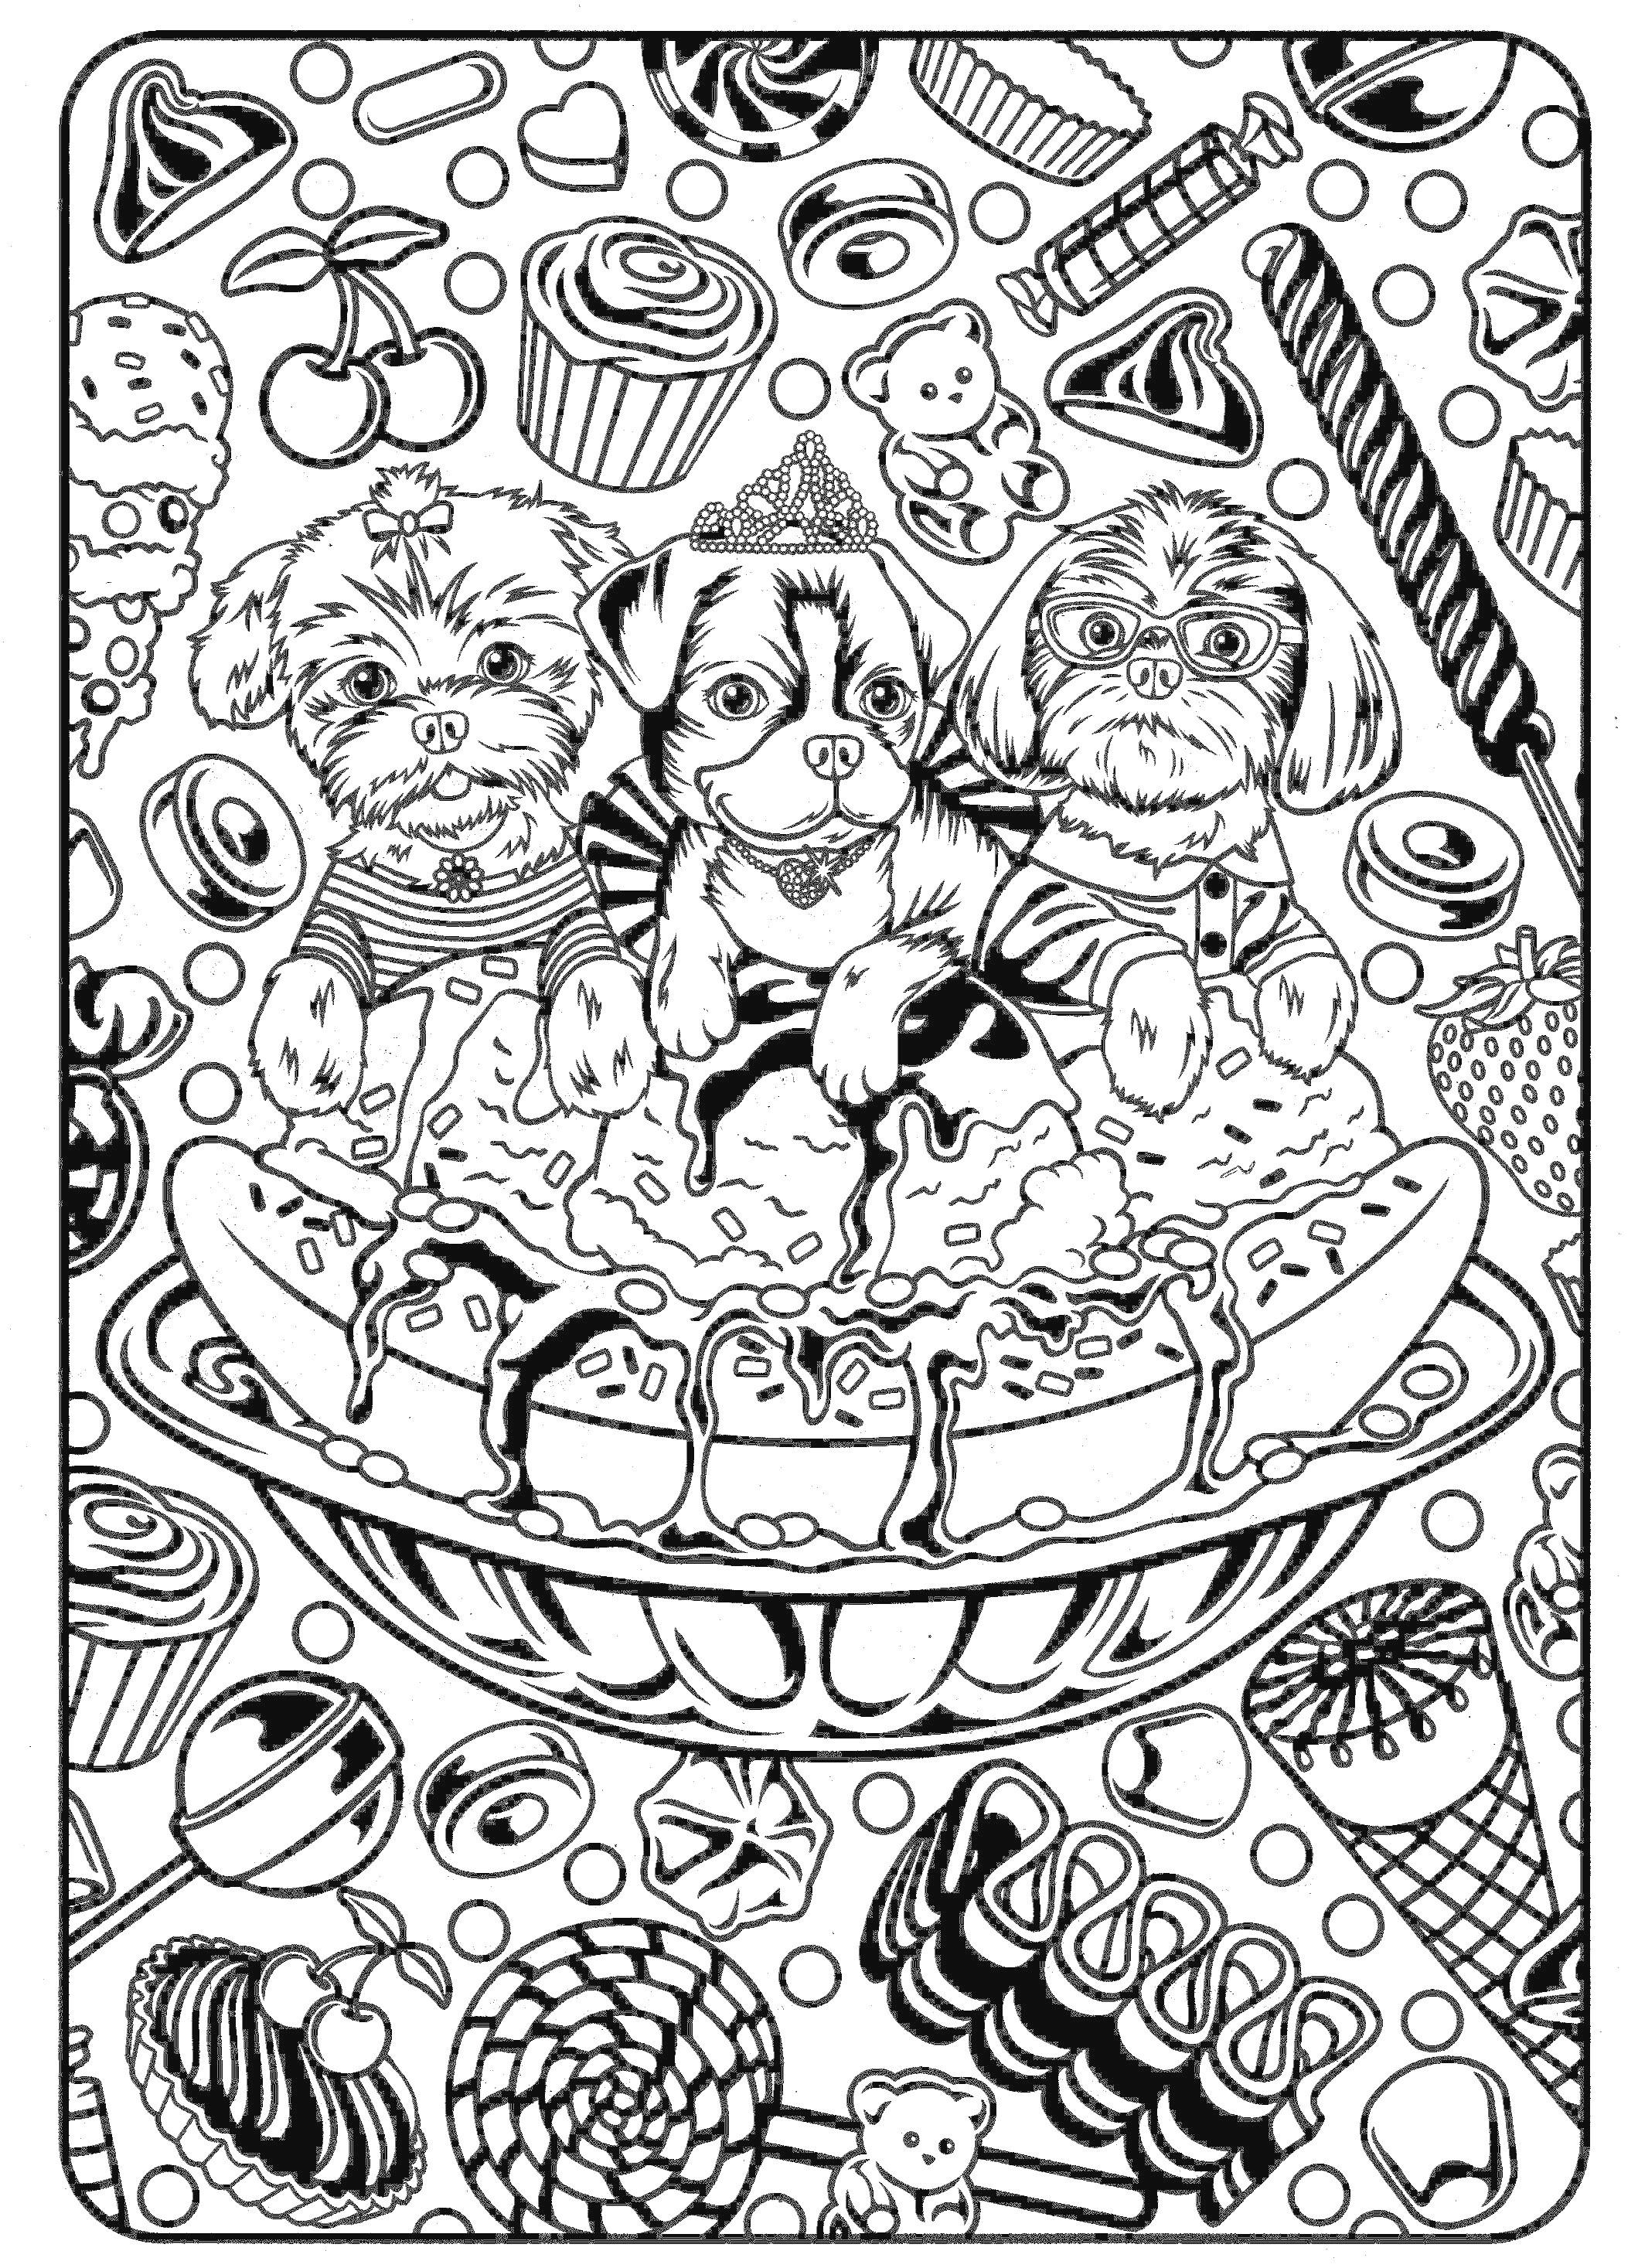 Free Ninja Turtle Printables Coloring Pages | Coloring Pages - Free Printable Coloring Pages For Teens